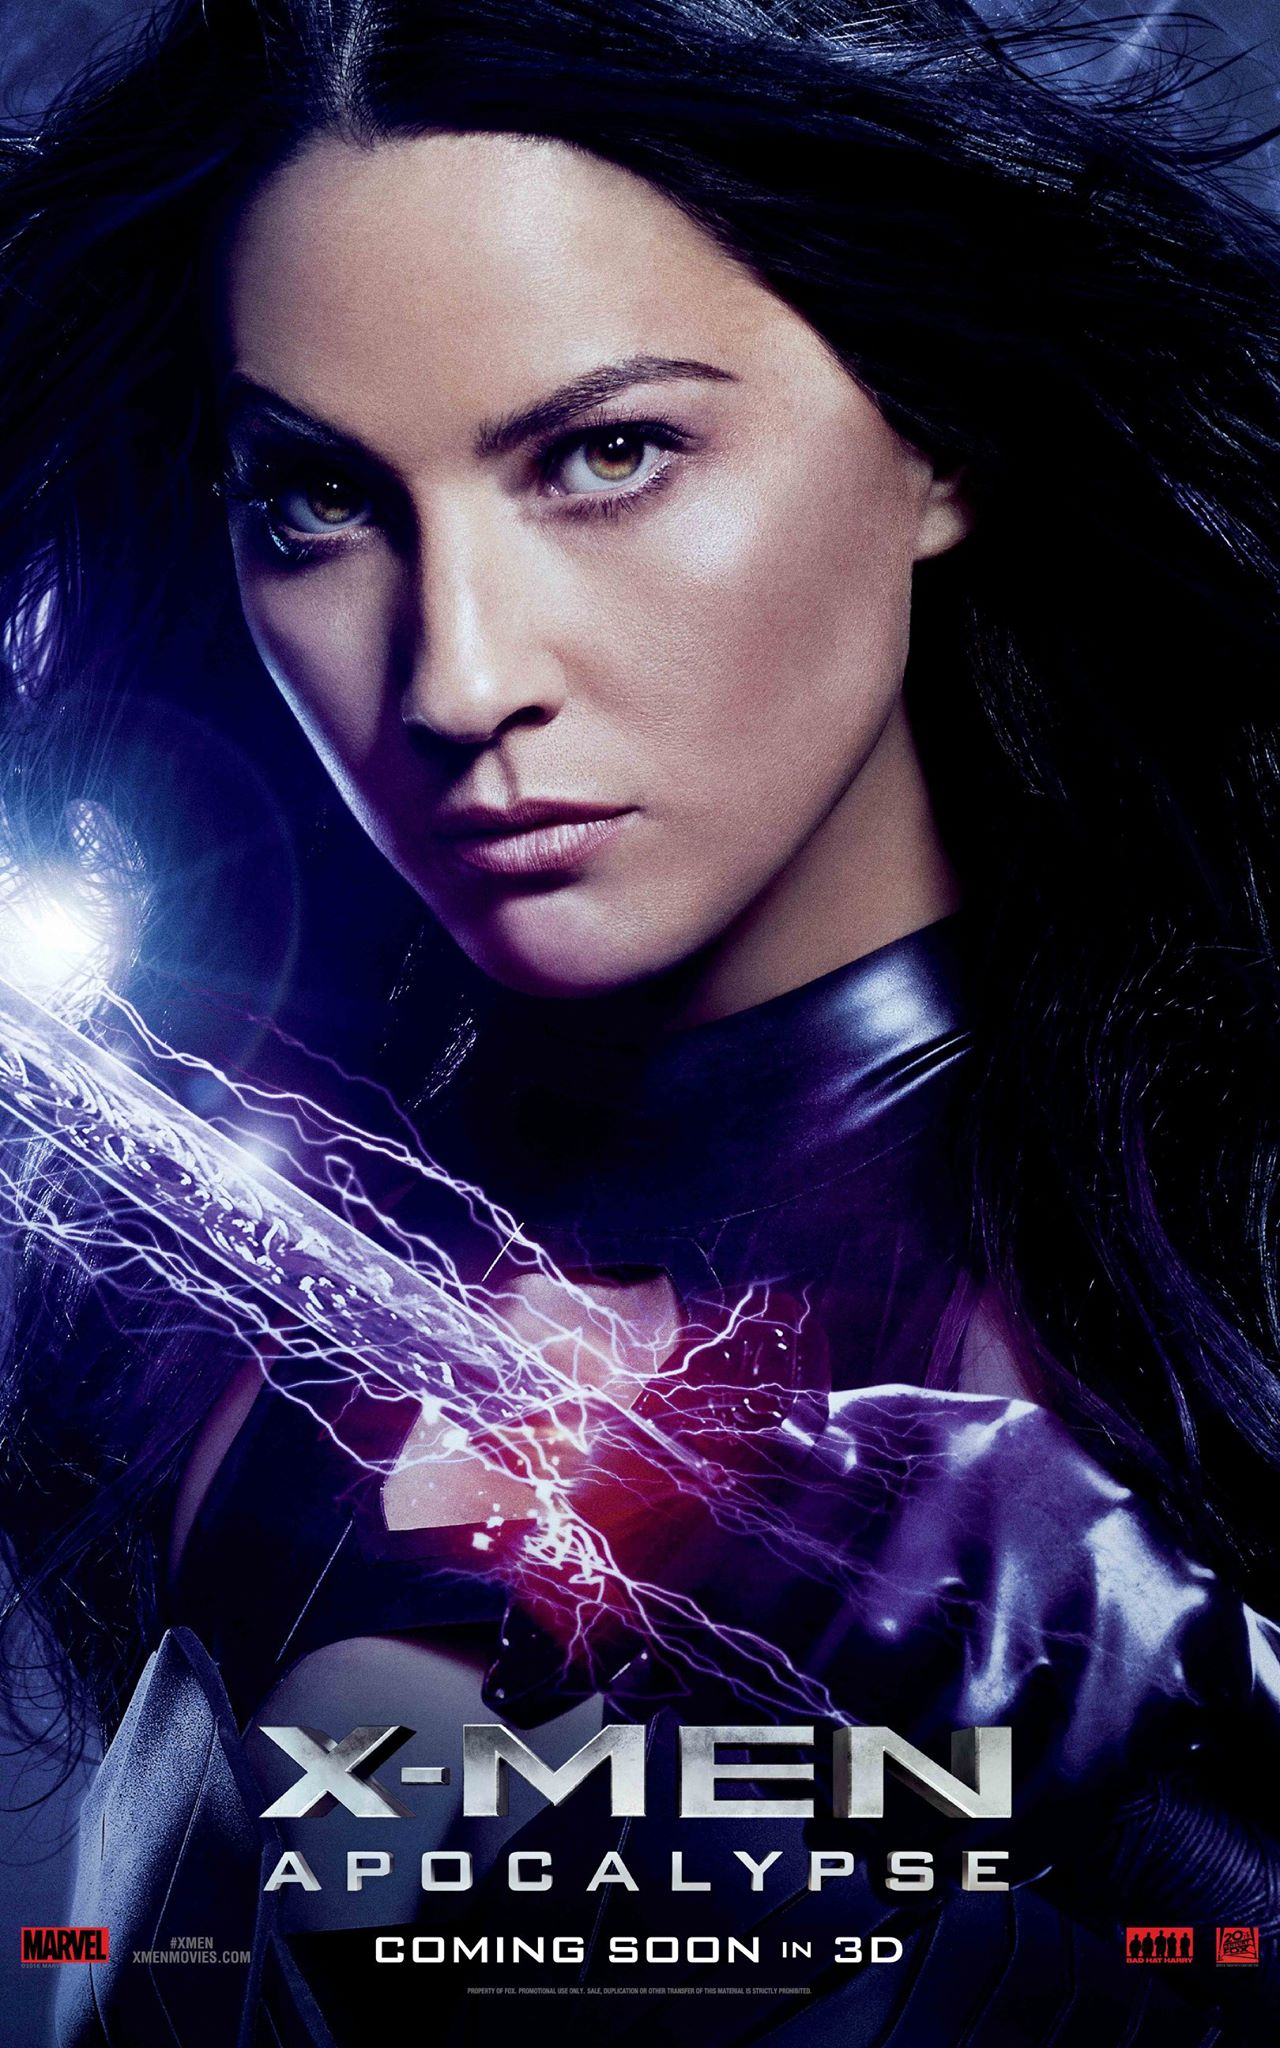 Psylocke character poster